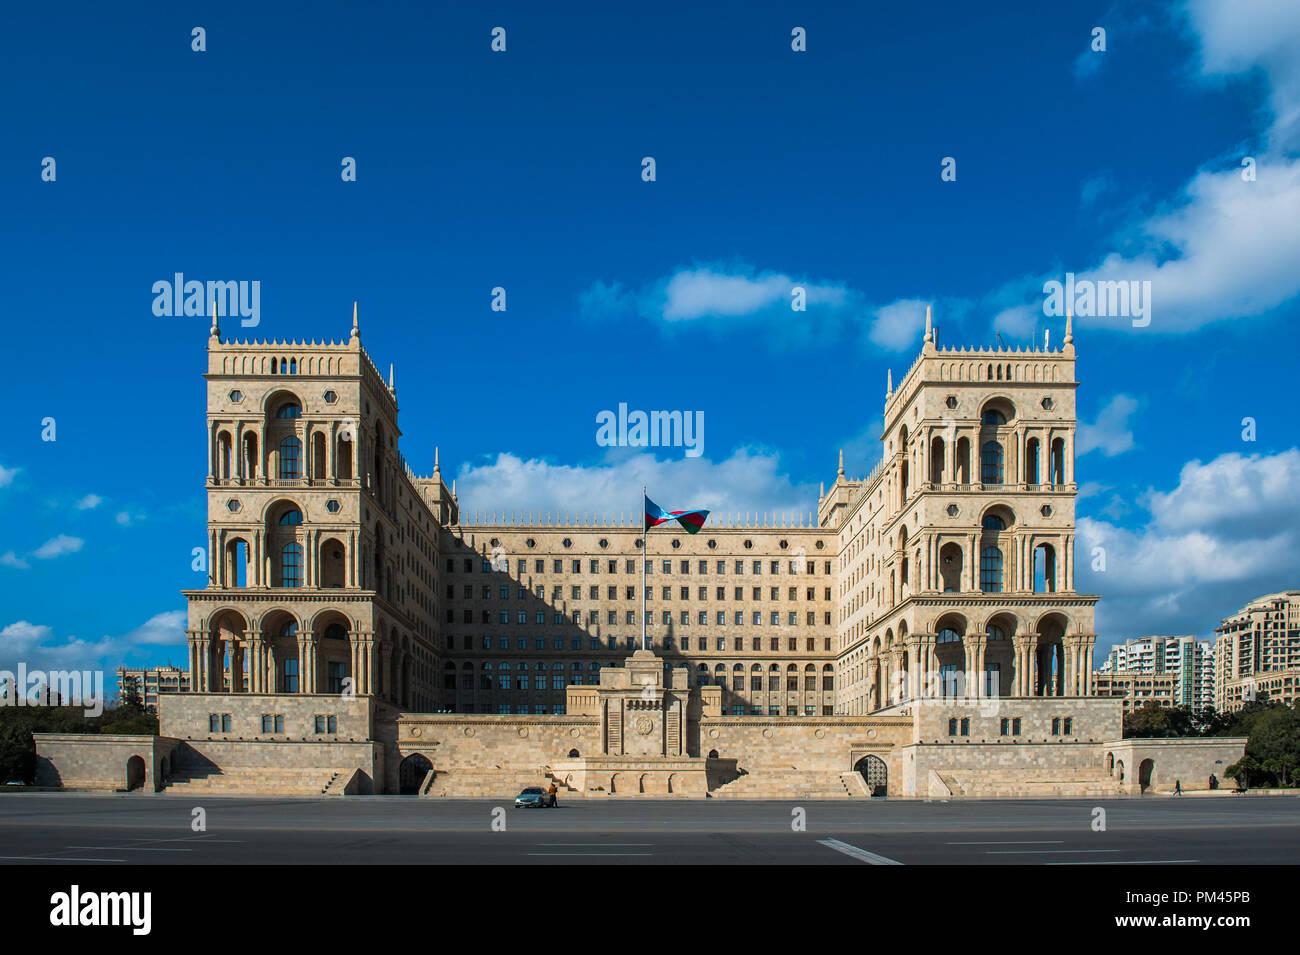 City view of the capital of Azerbaijan, Baku. - Stock Image